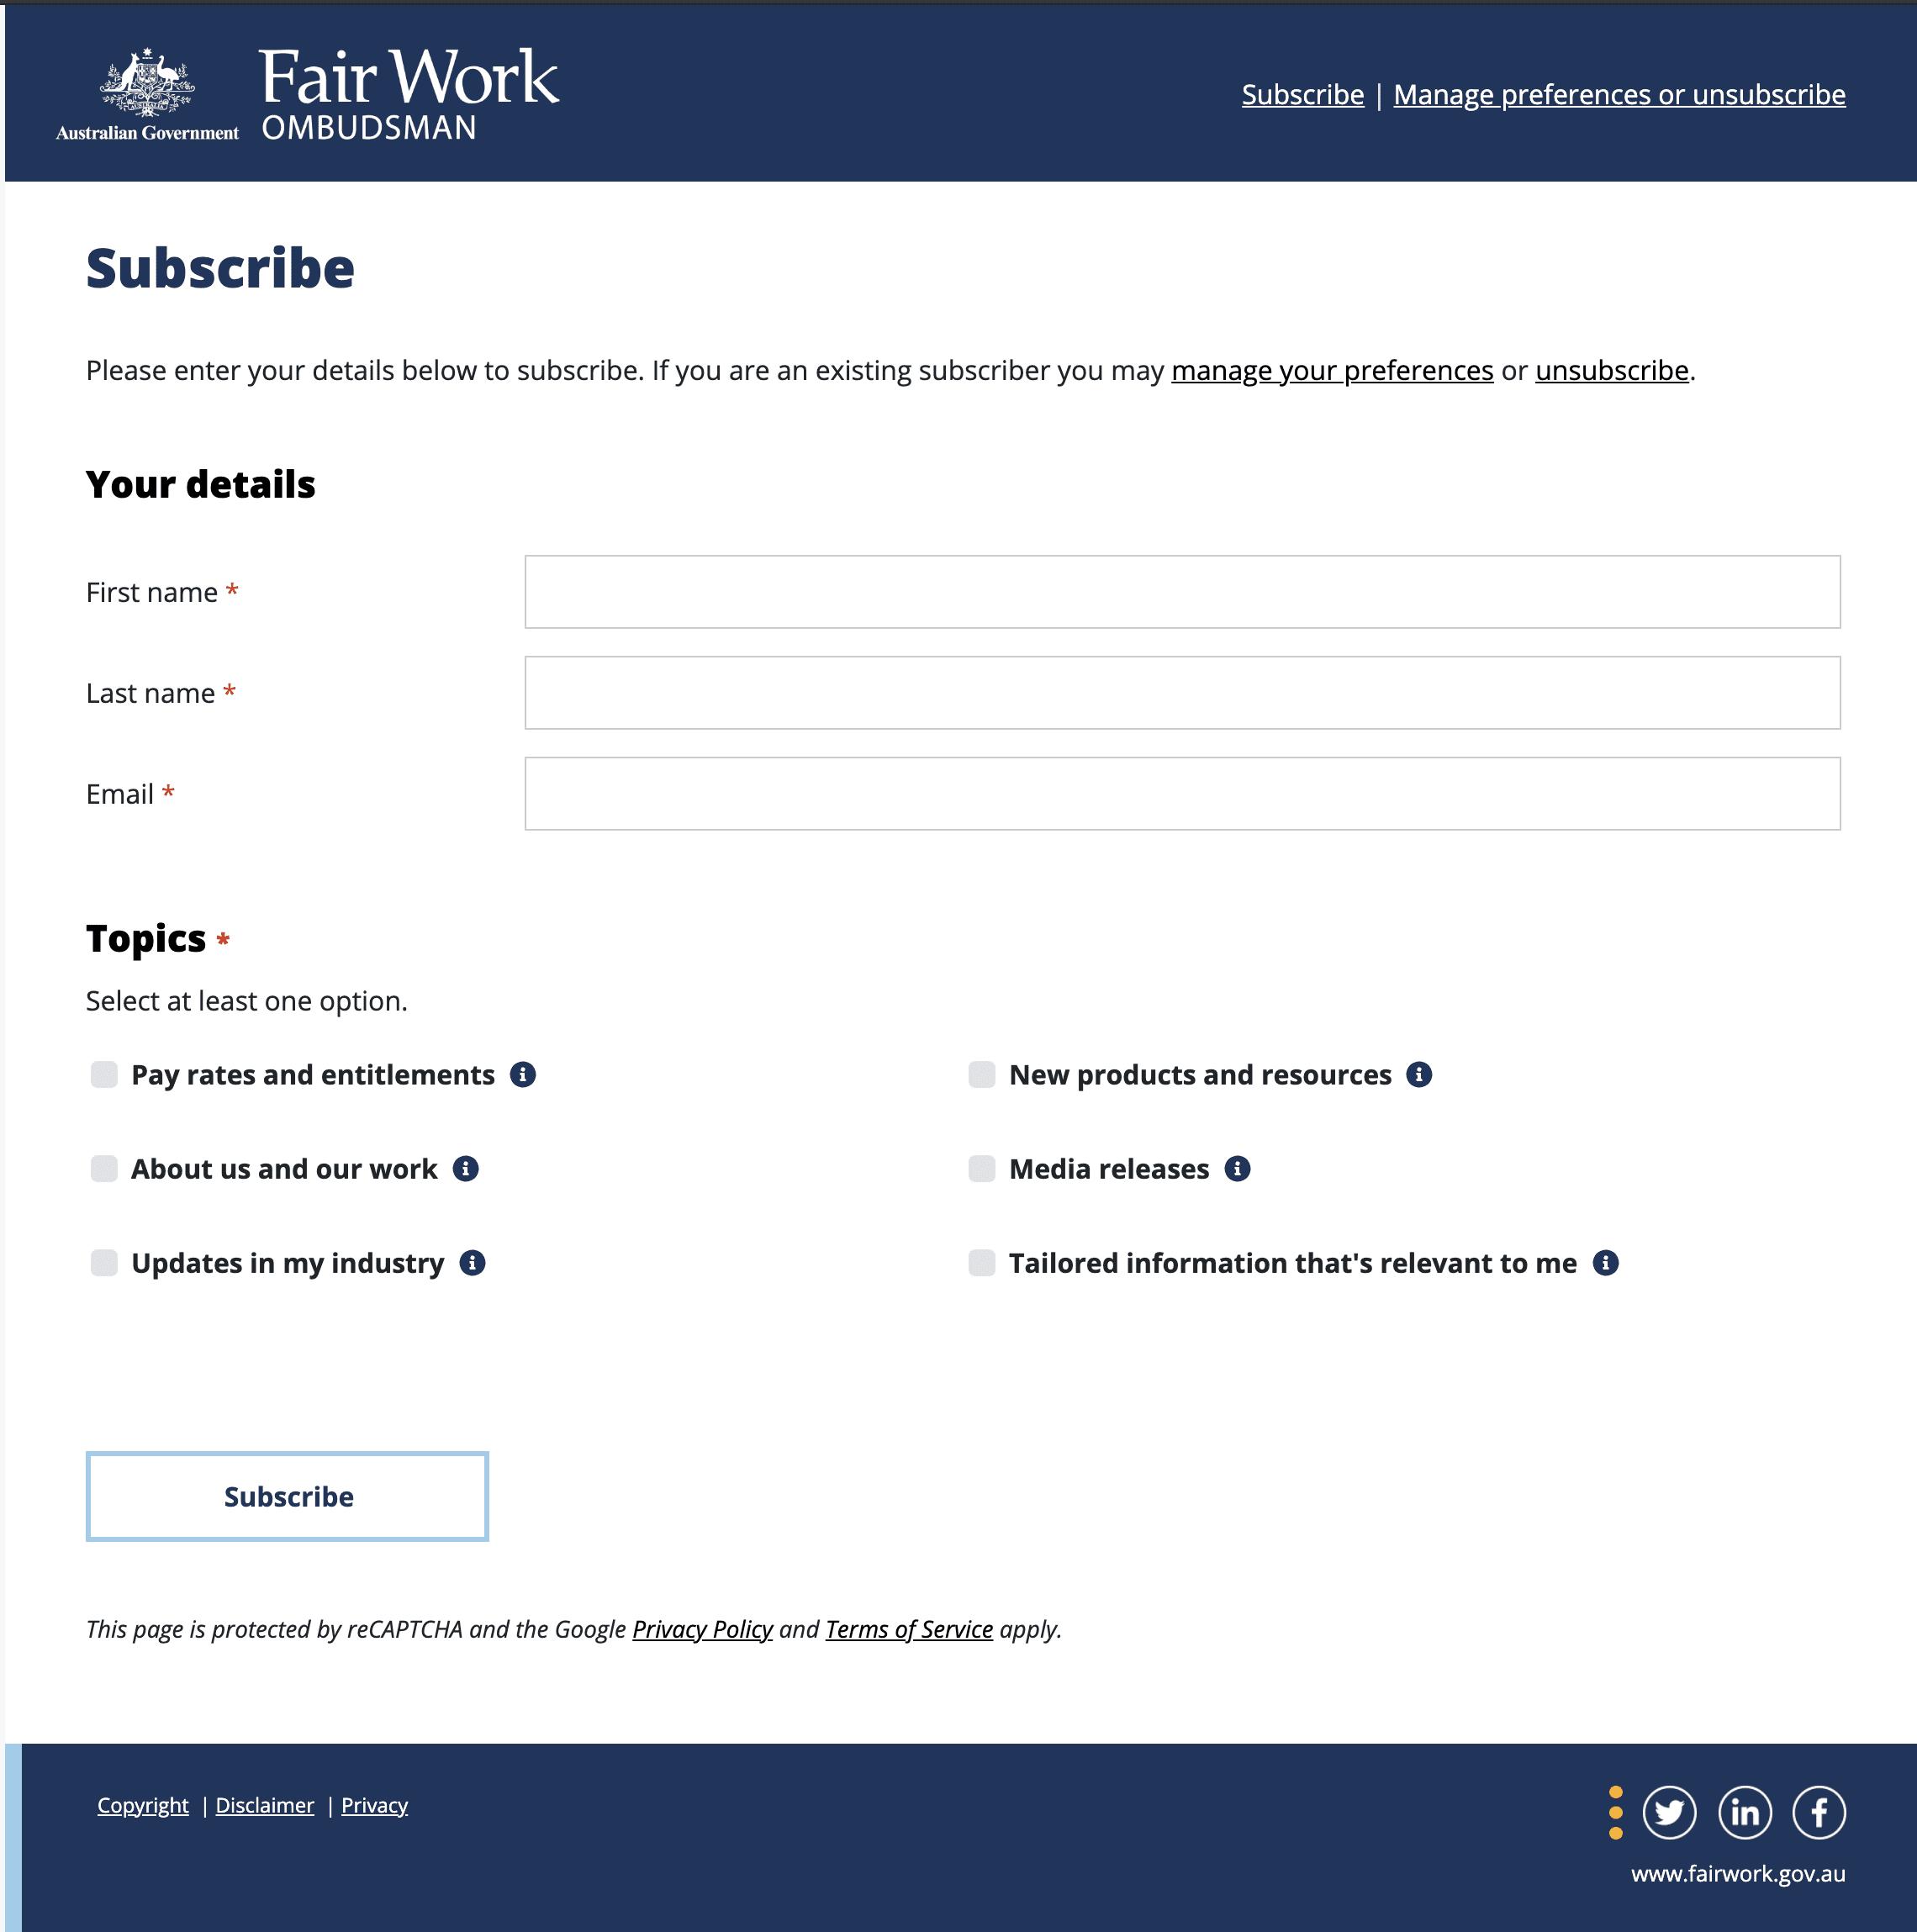 Fairwork Ombudsman Subscription Preference Centre Swift Digital